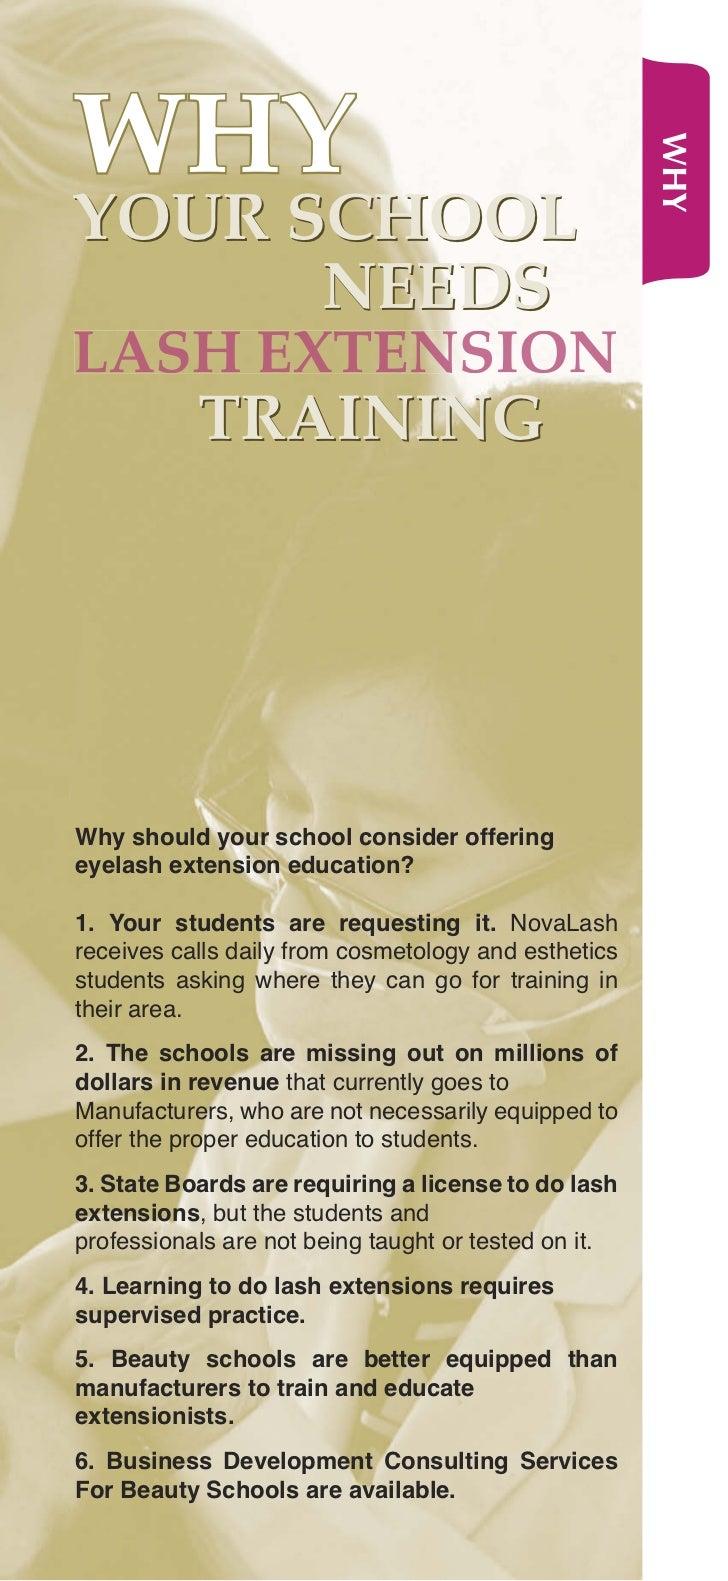 International Academy of Eyelash Arts & Sciences